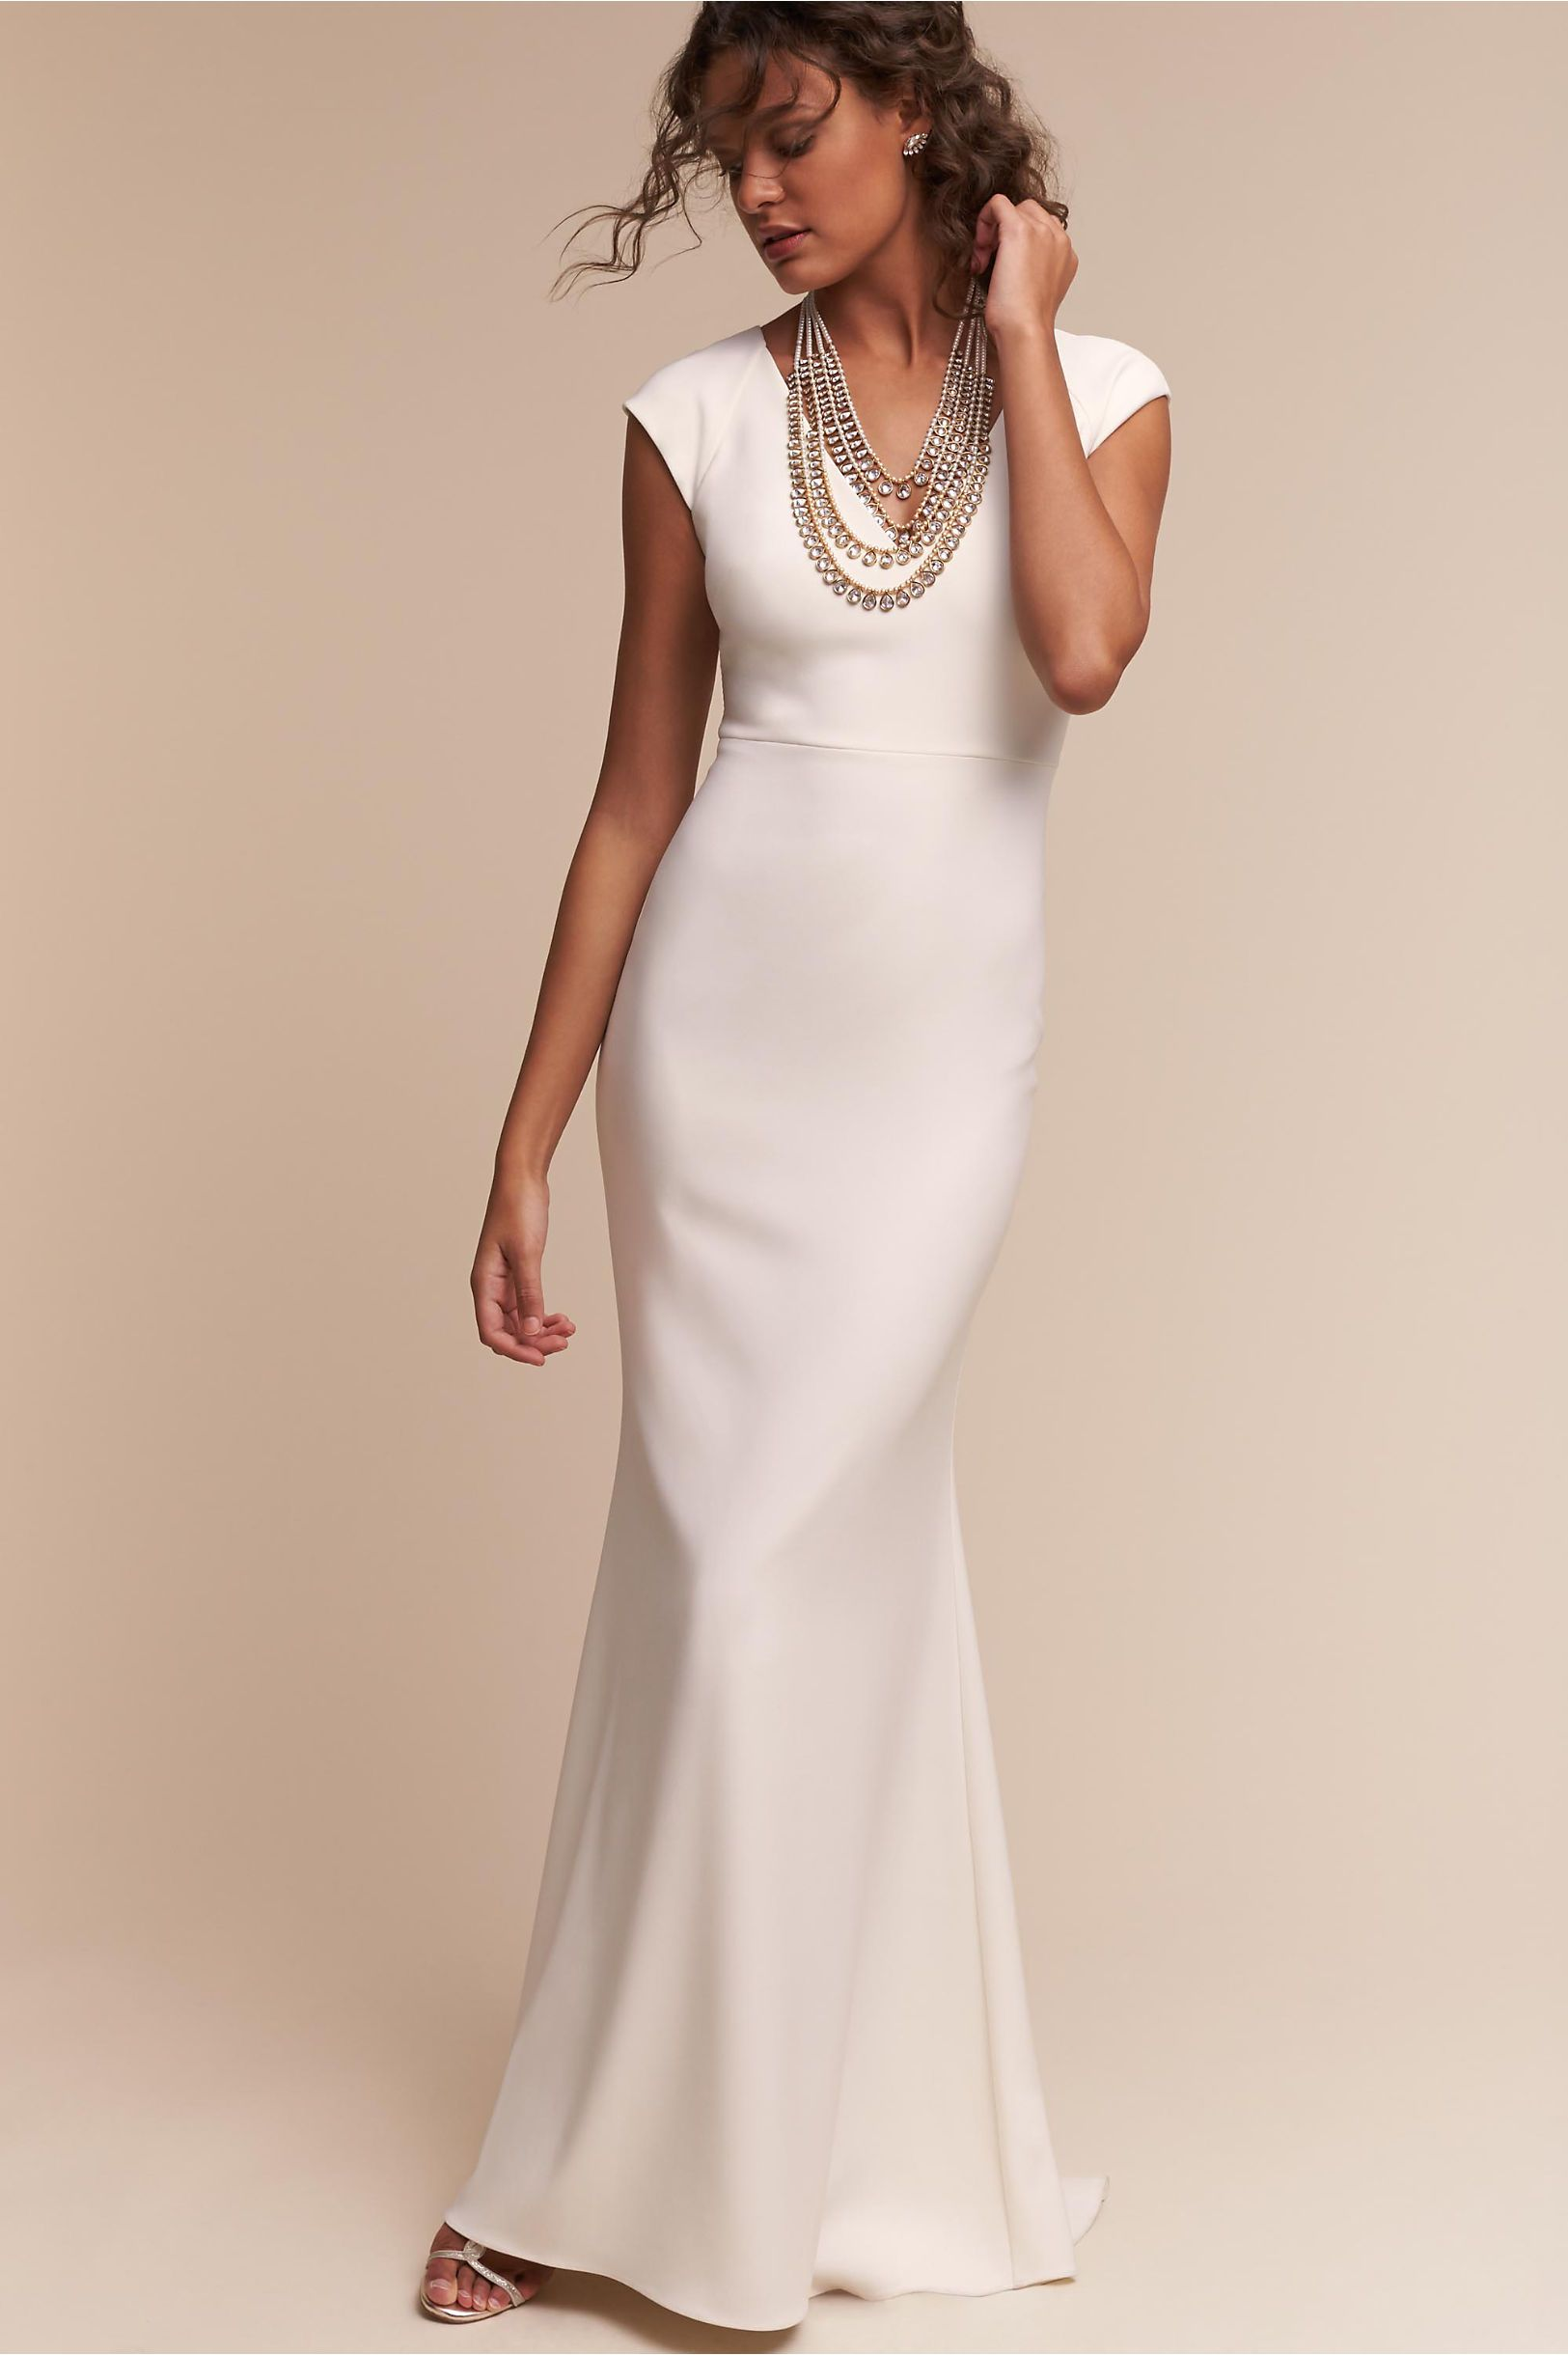 Pin by aja kusao on wedding dresses pinterest wedding dress and